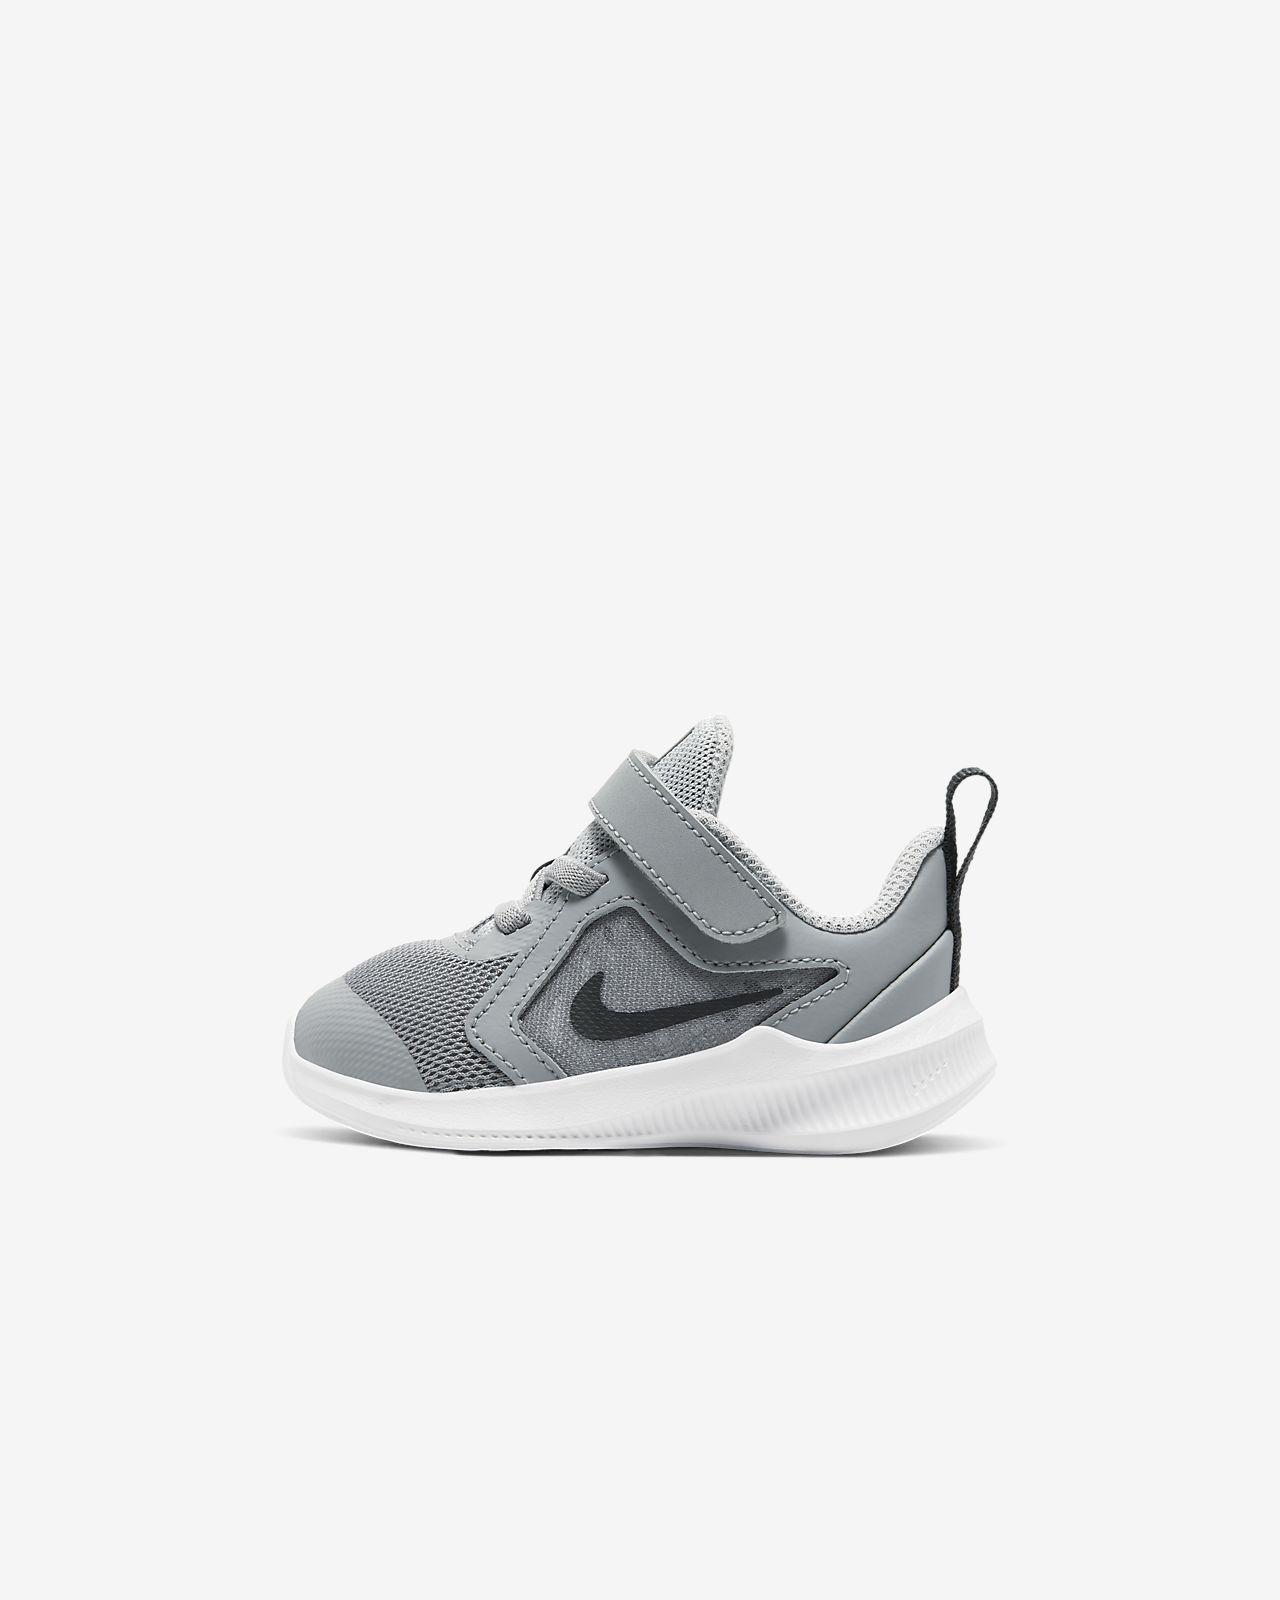 Nike Downshifter 10 Baby/Toddler Shoe